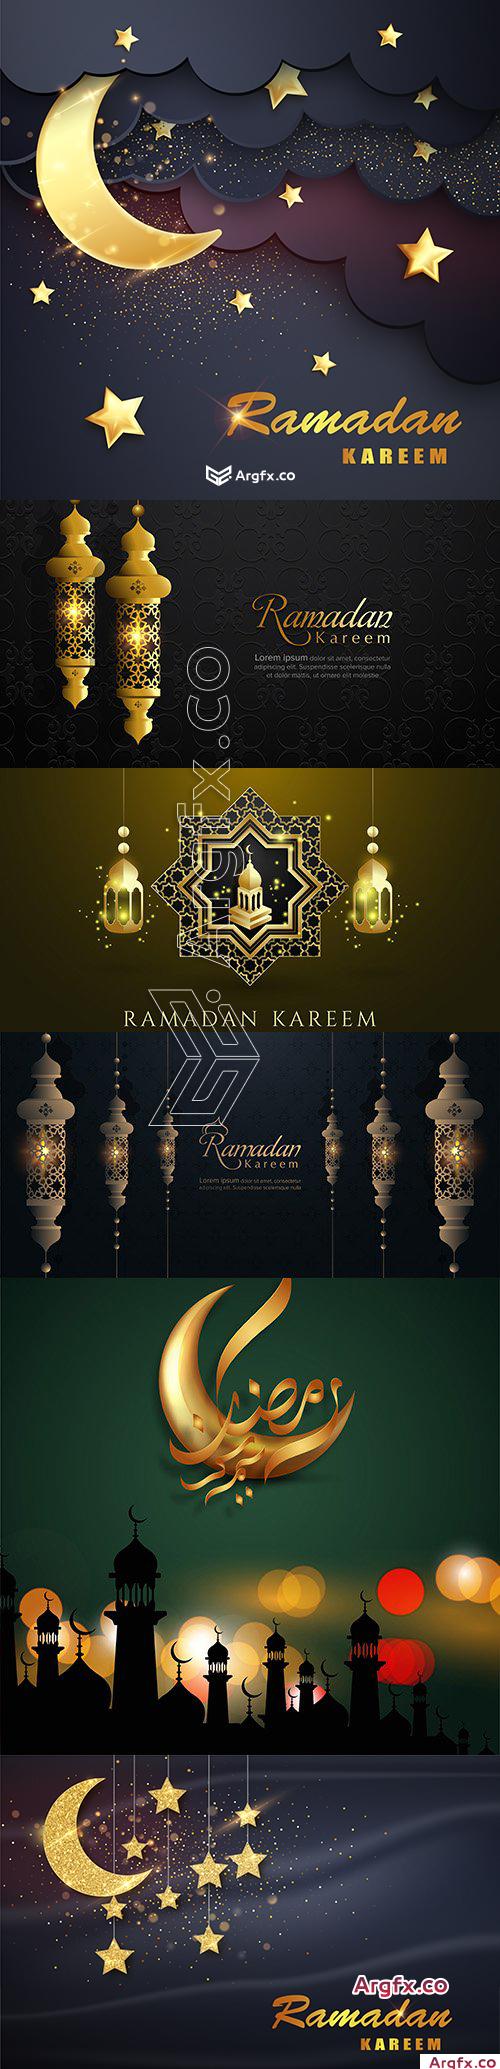 Ramadan Kareem moon and luxurious Islamic background elements